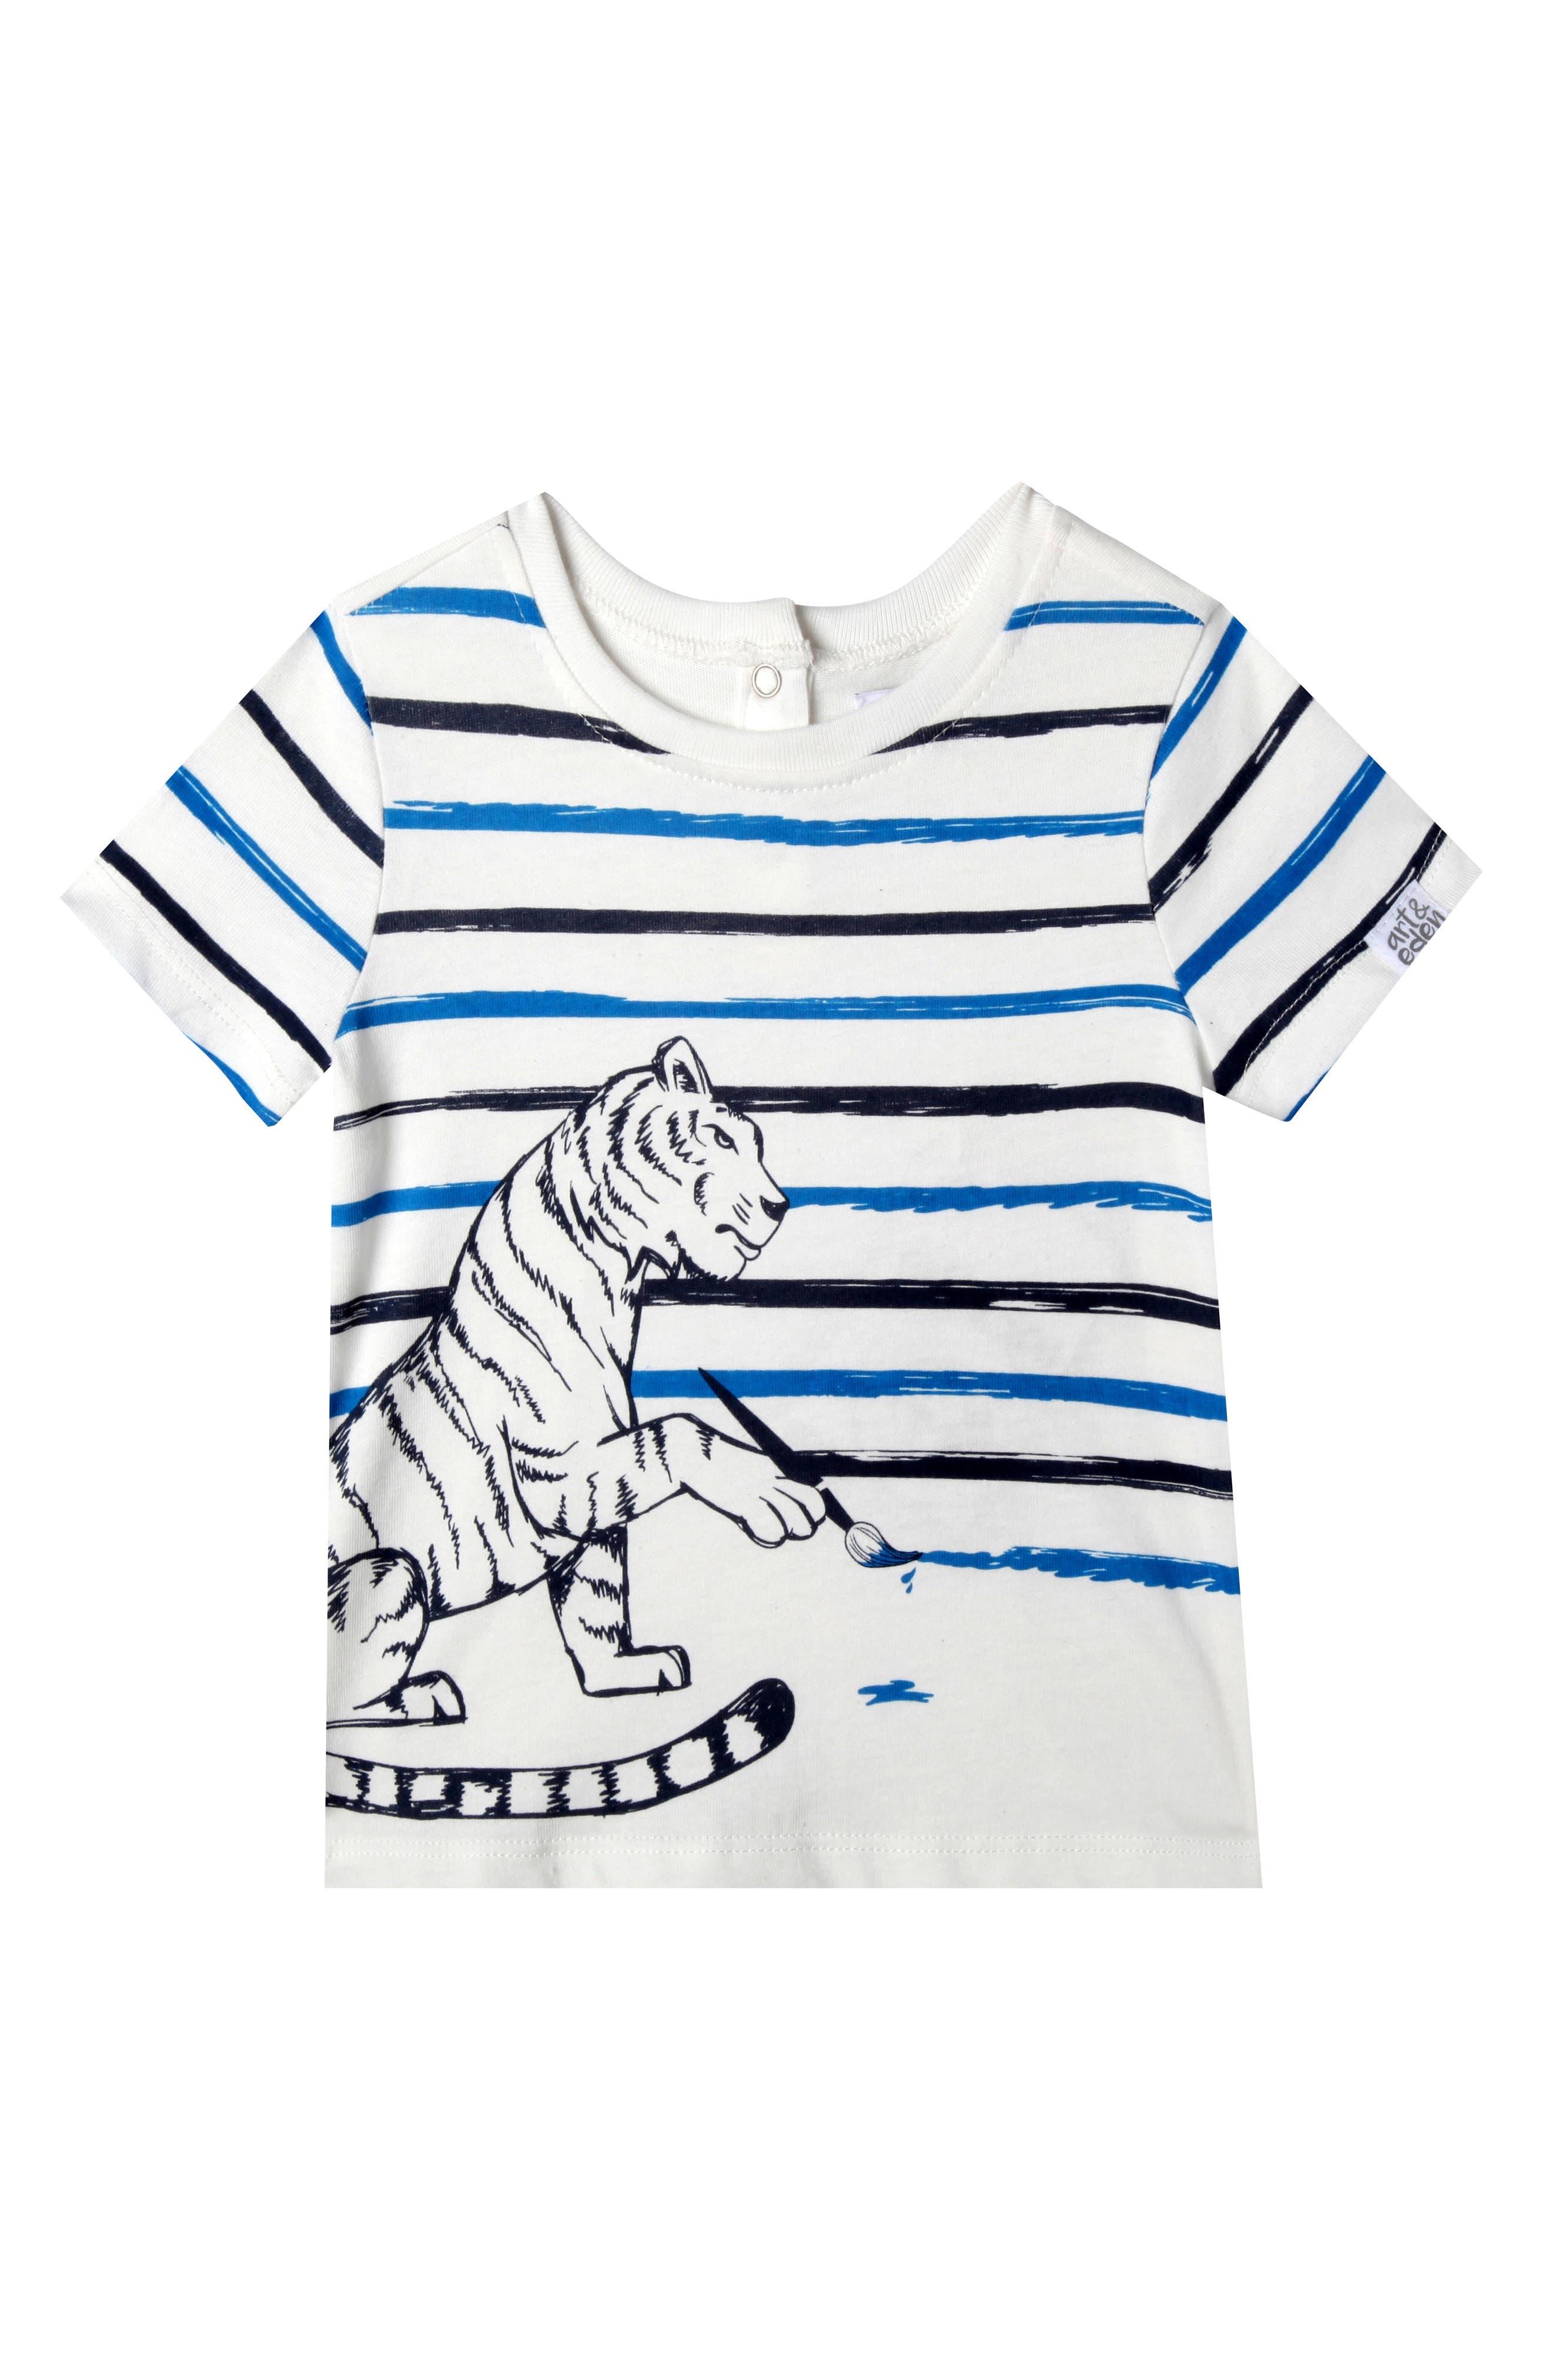 Main Image - Art & Eden Caleb T-Shirt (Baby Boys)